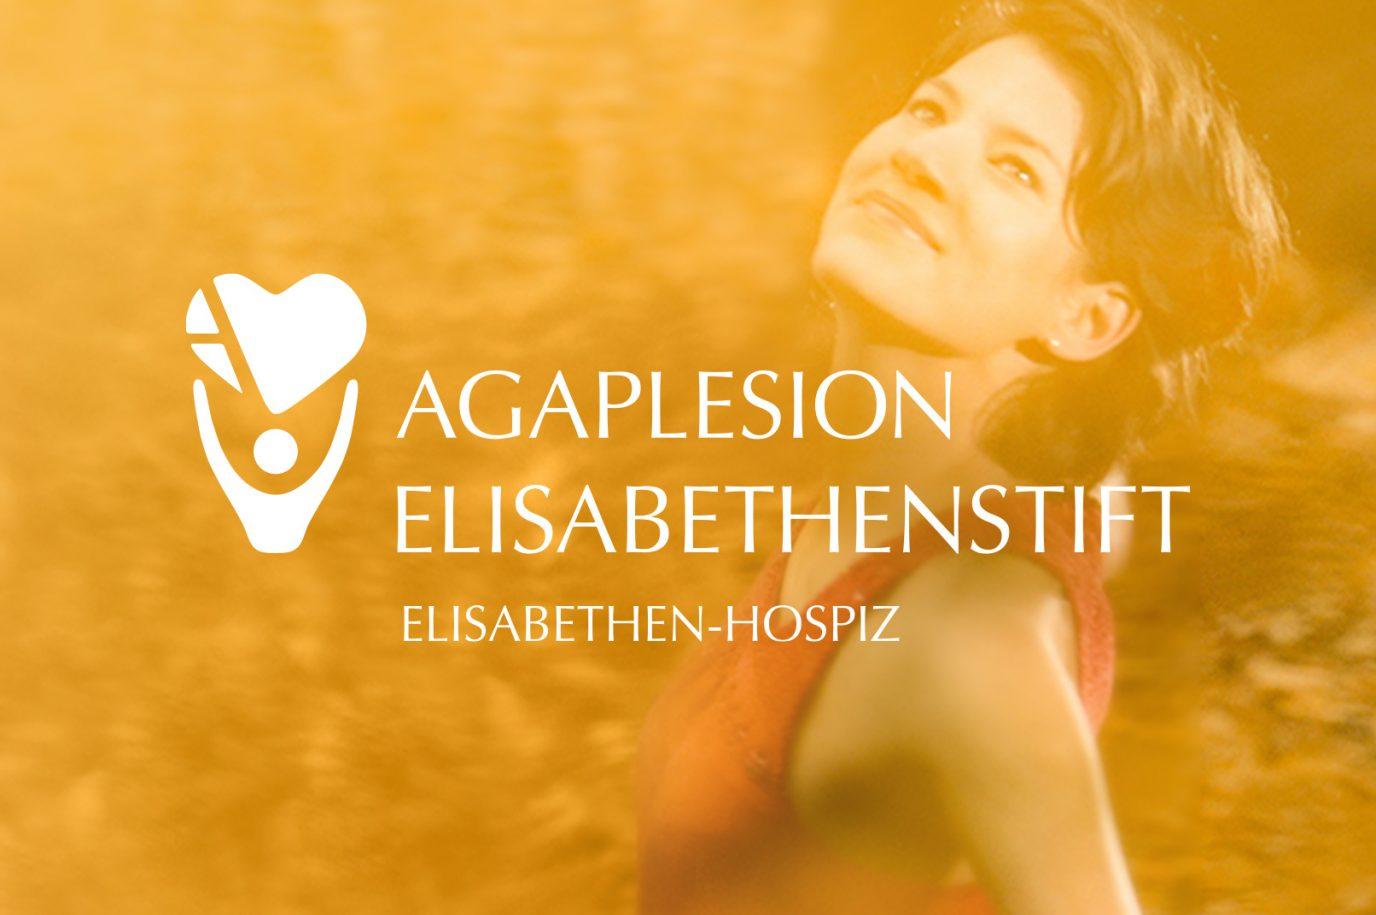 Elisabethen Hospiz Portfolio 1612x1140px